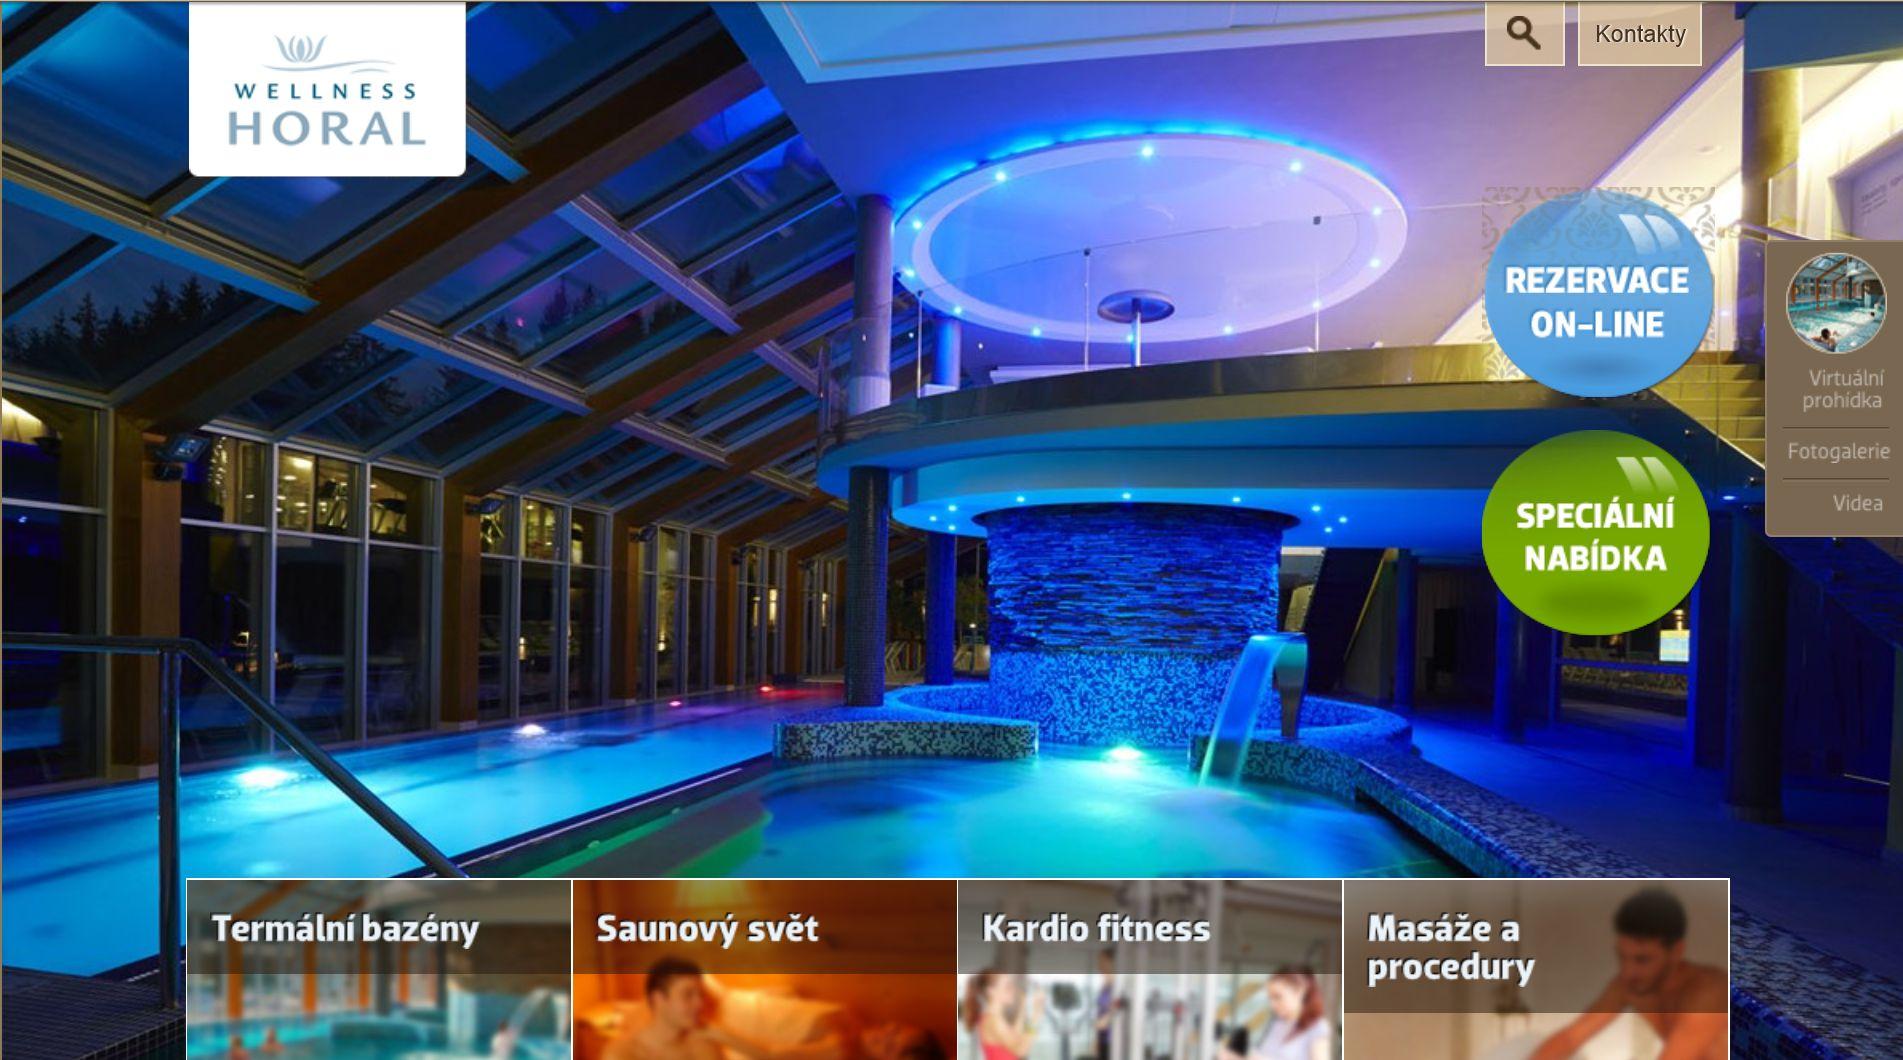 Wellness hotel Horal - Velké Karlovice